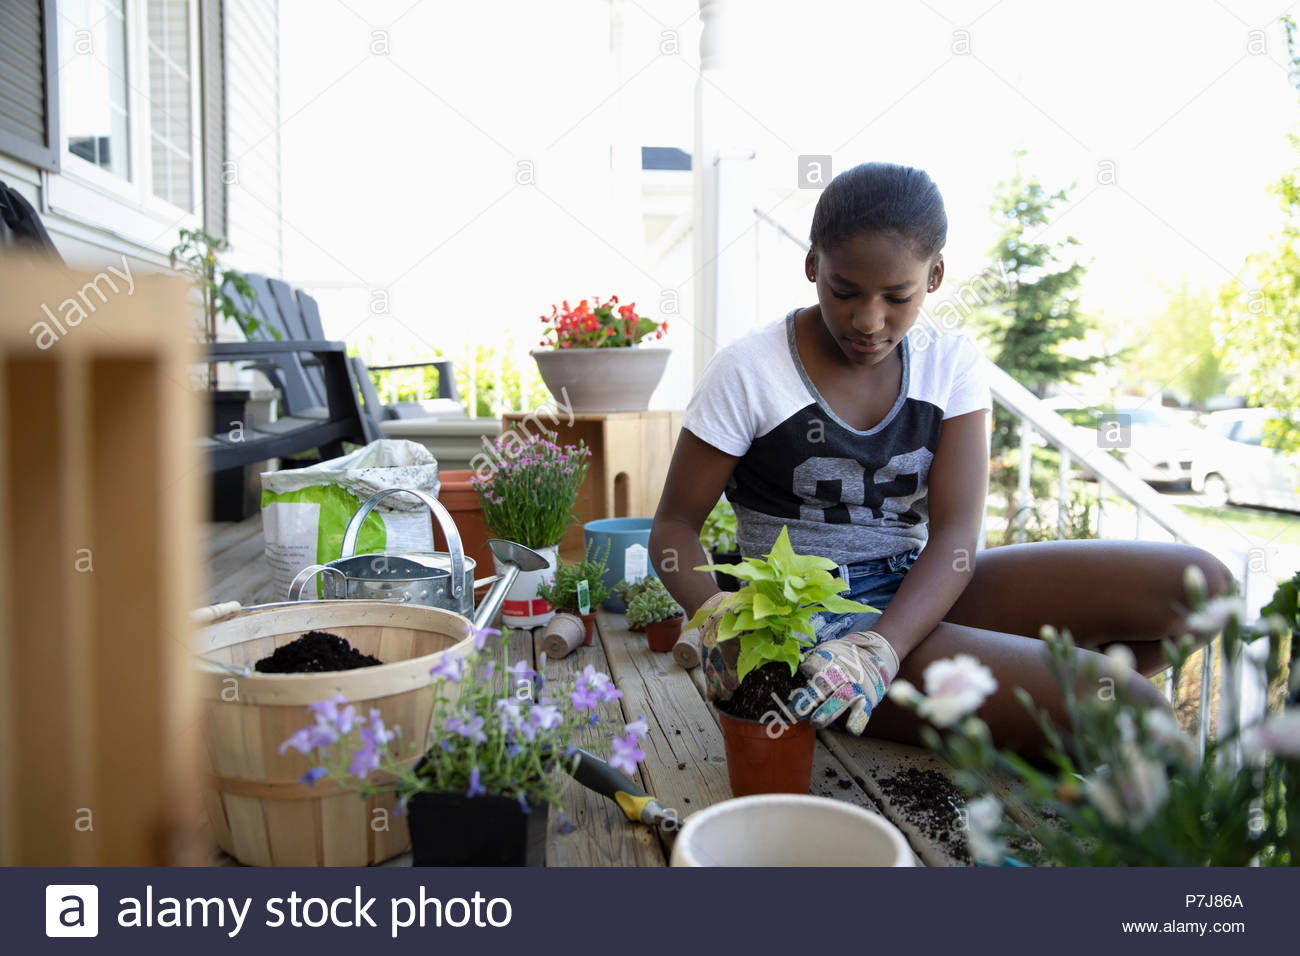 Tween girl potting plants on front stoop - Stock Image